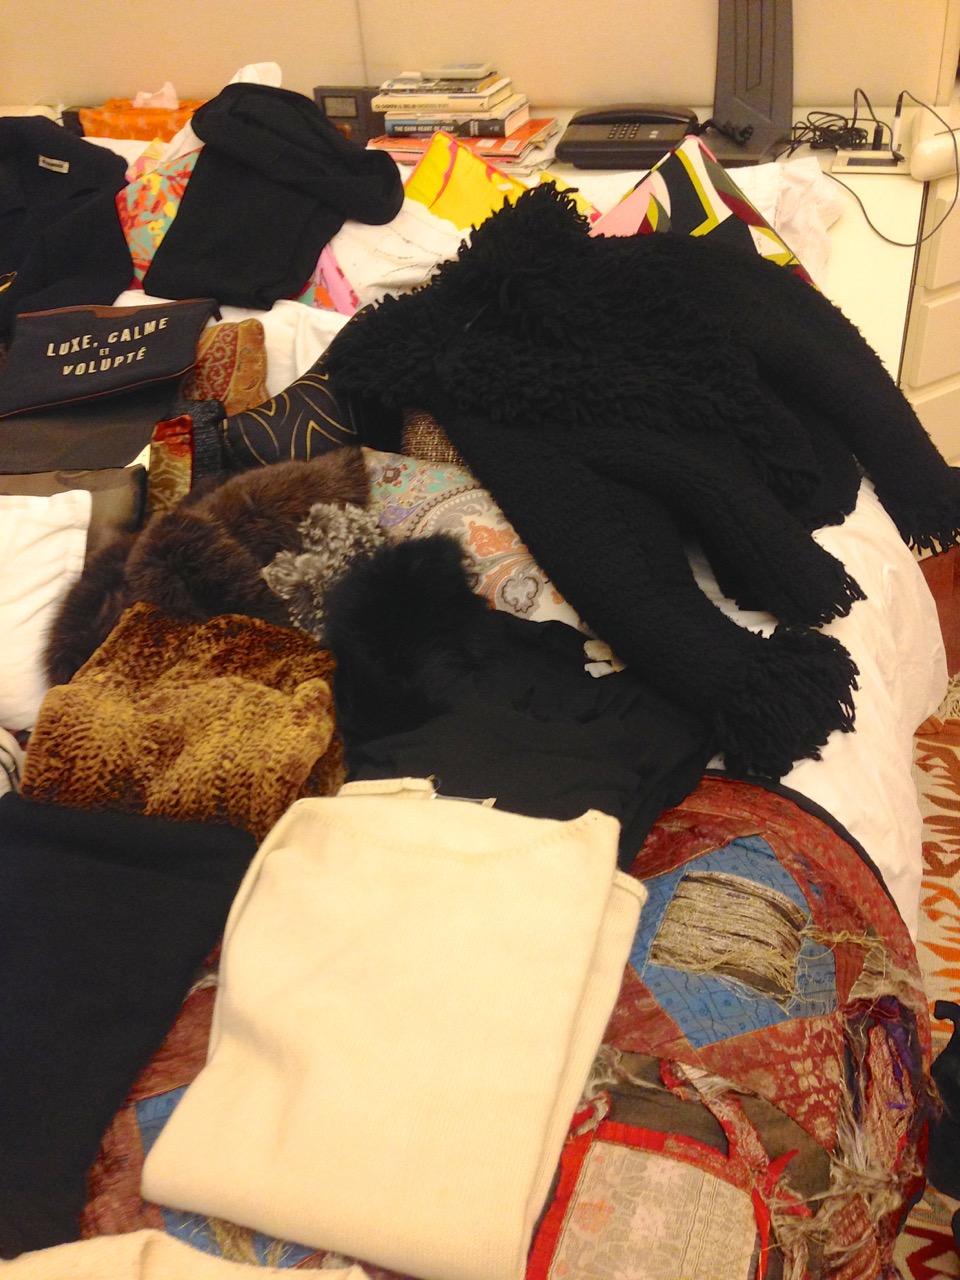 Por baixo suéter preto ou branco.  Levei 1 branco, 3 pretos (gola roulé, oversize e evasé)